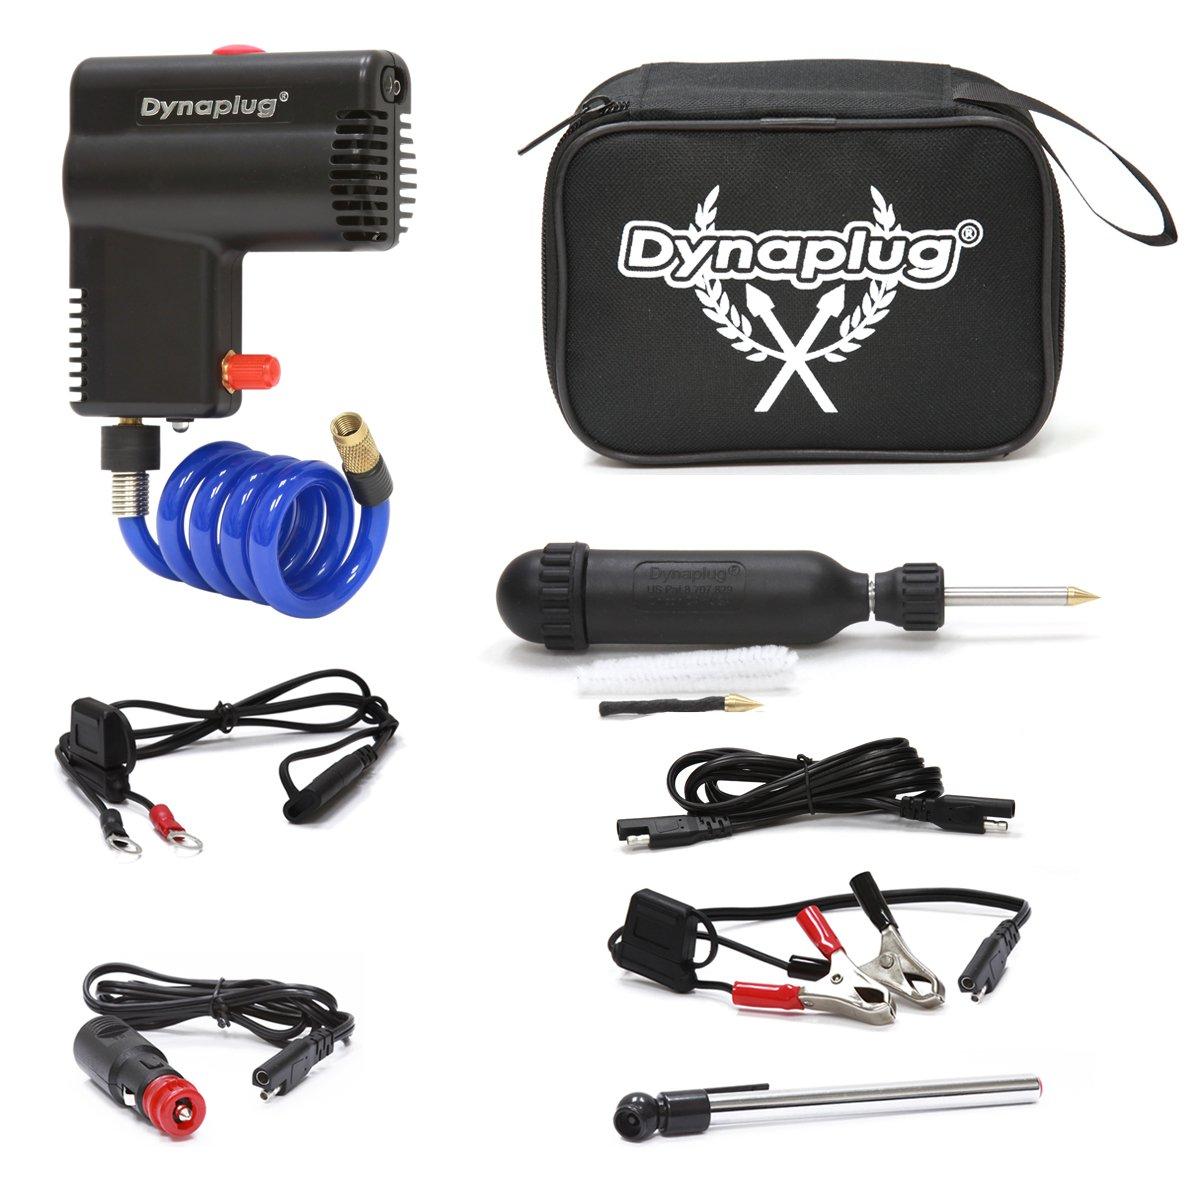 Dynaplug Motorcycle 12 volt Tire Inflator with BONUS Dynaplug Carbon Ultralite Repair Tool